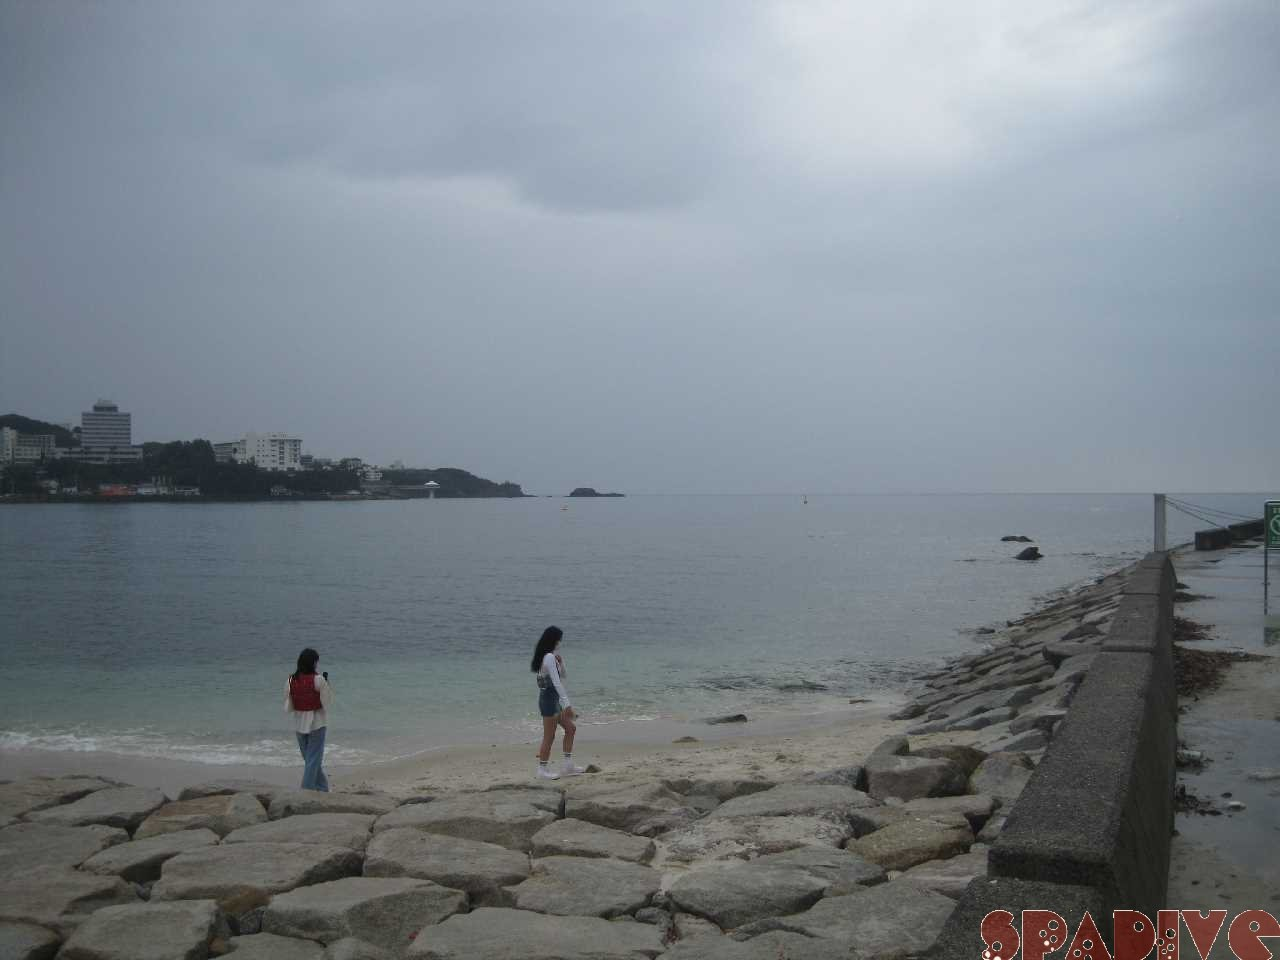 白浜権現崎ビーチ水中画像